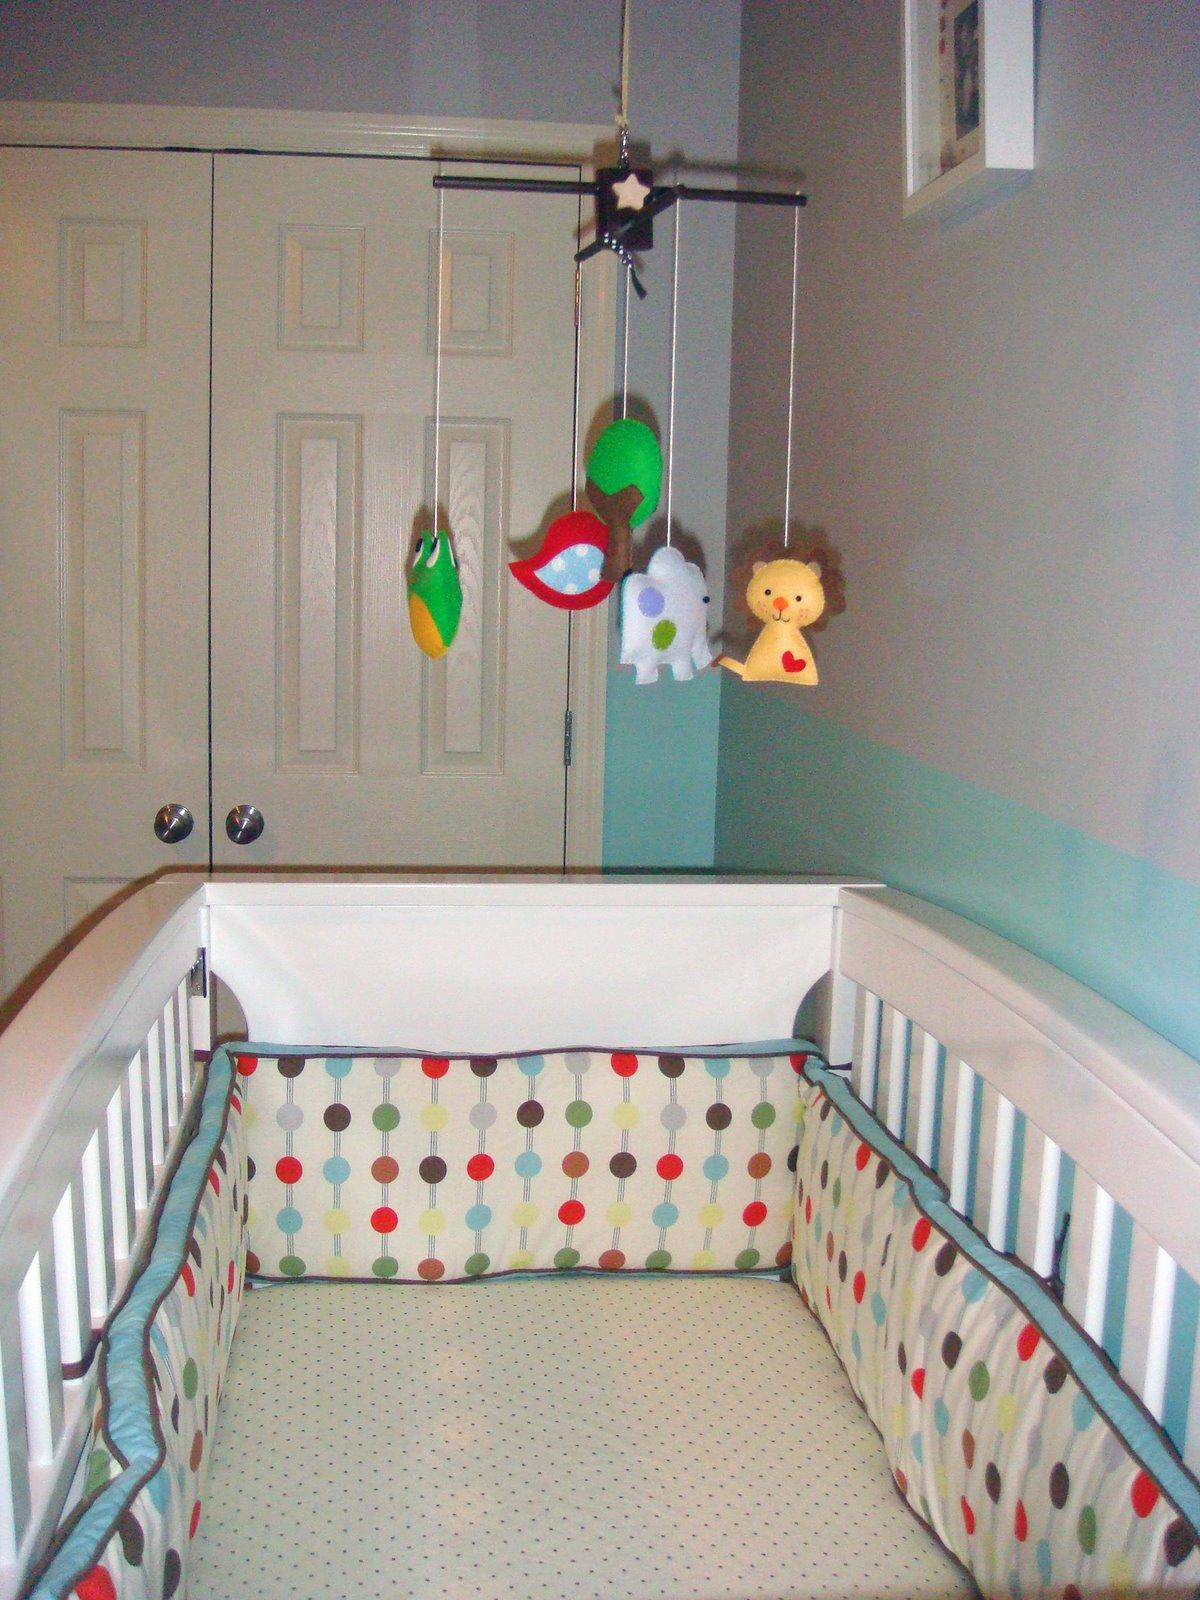 Nursery Final Touches